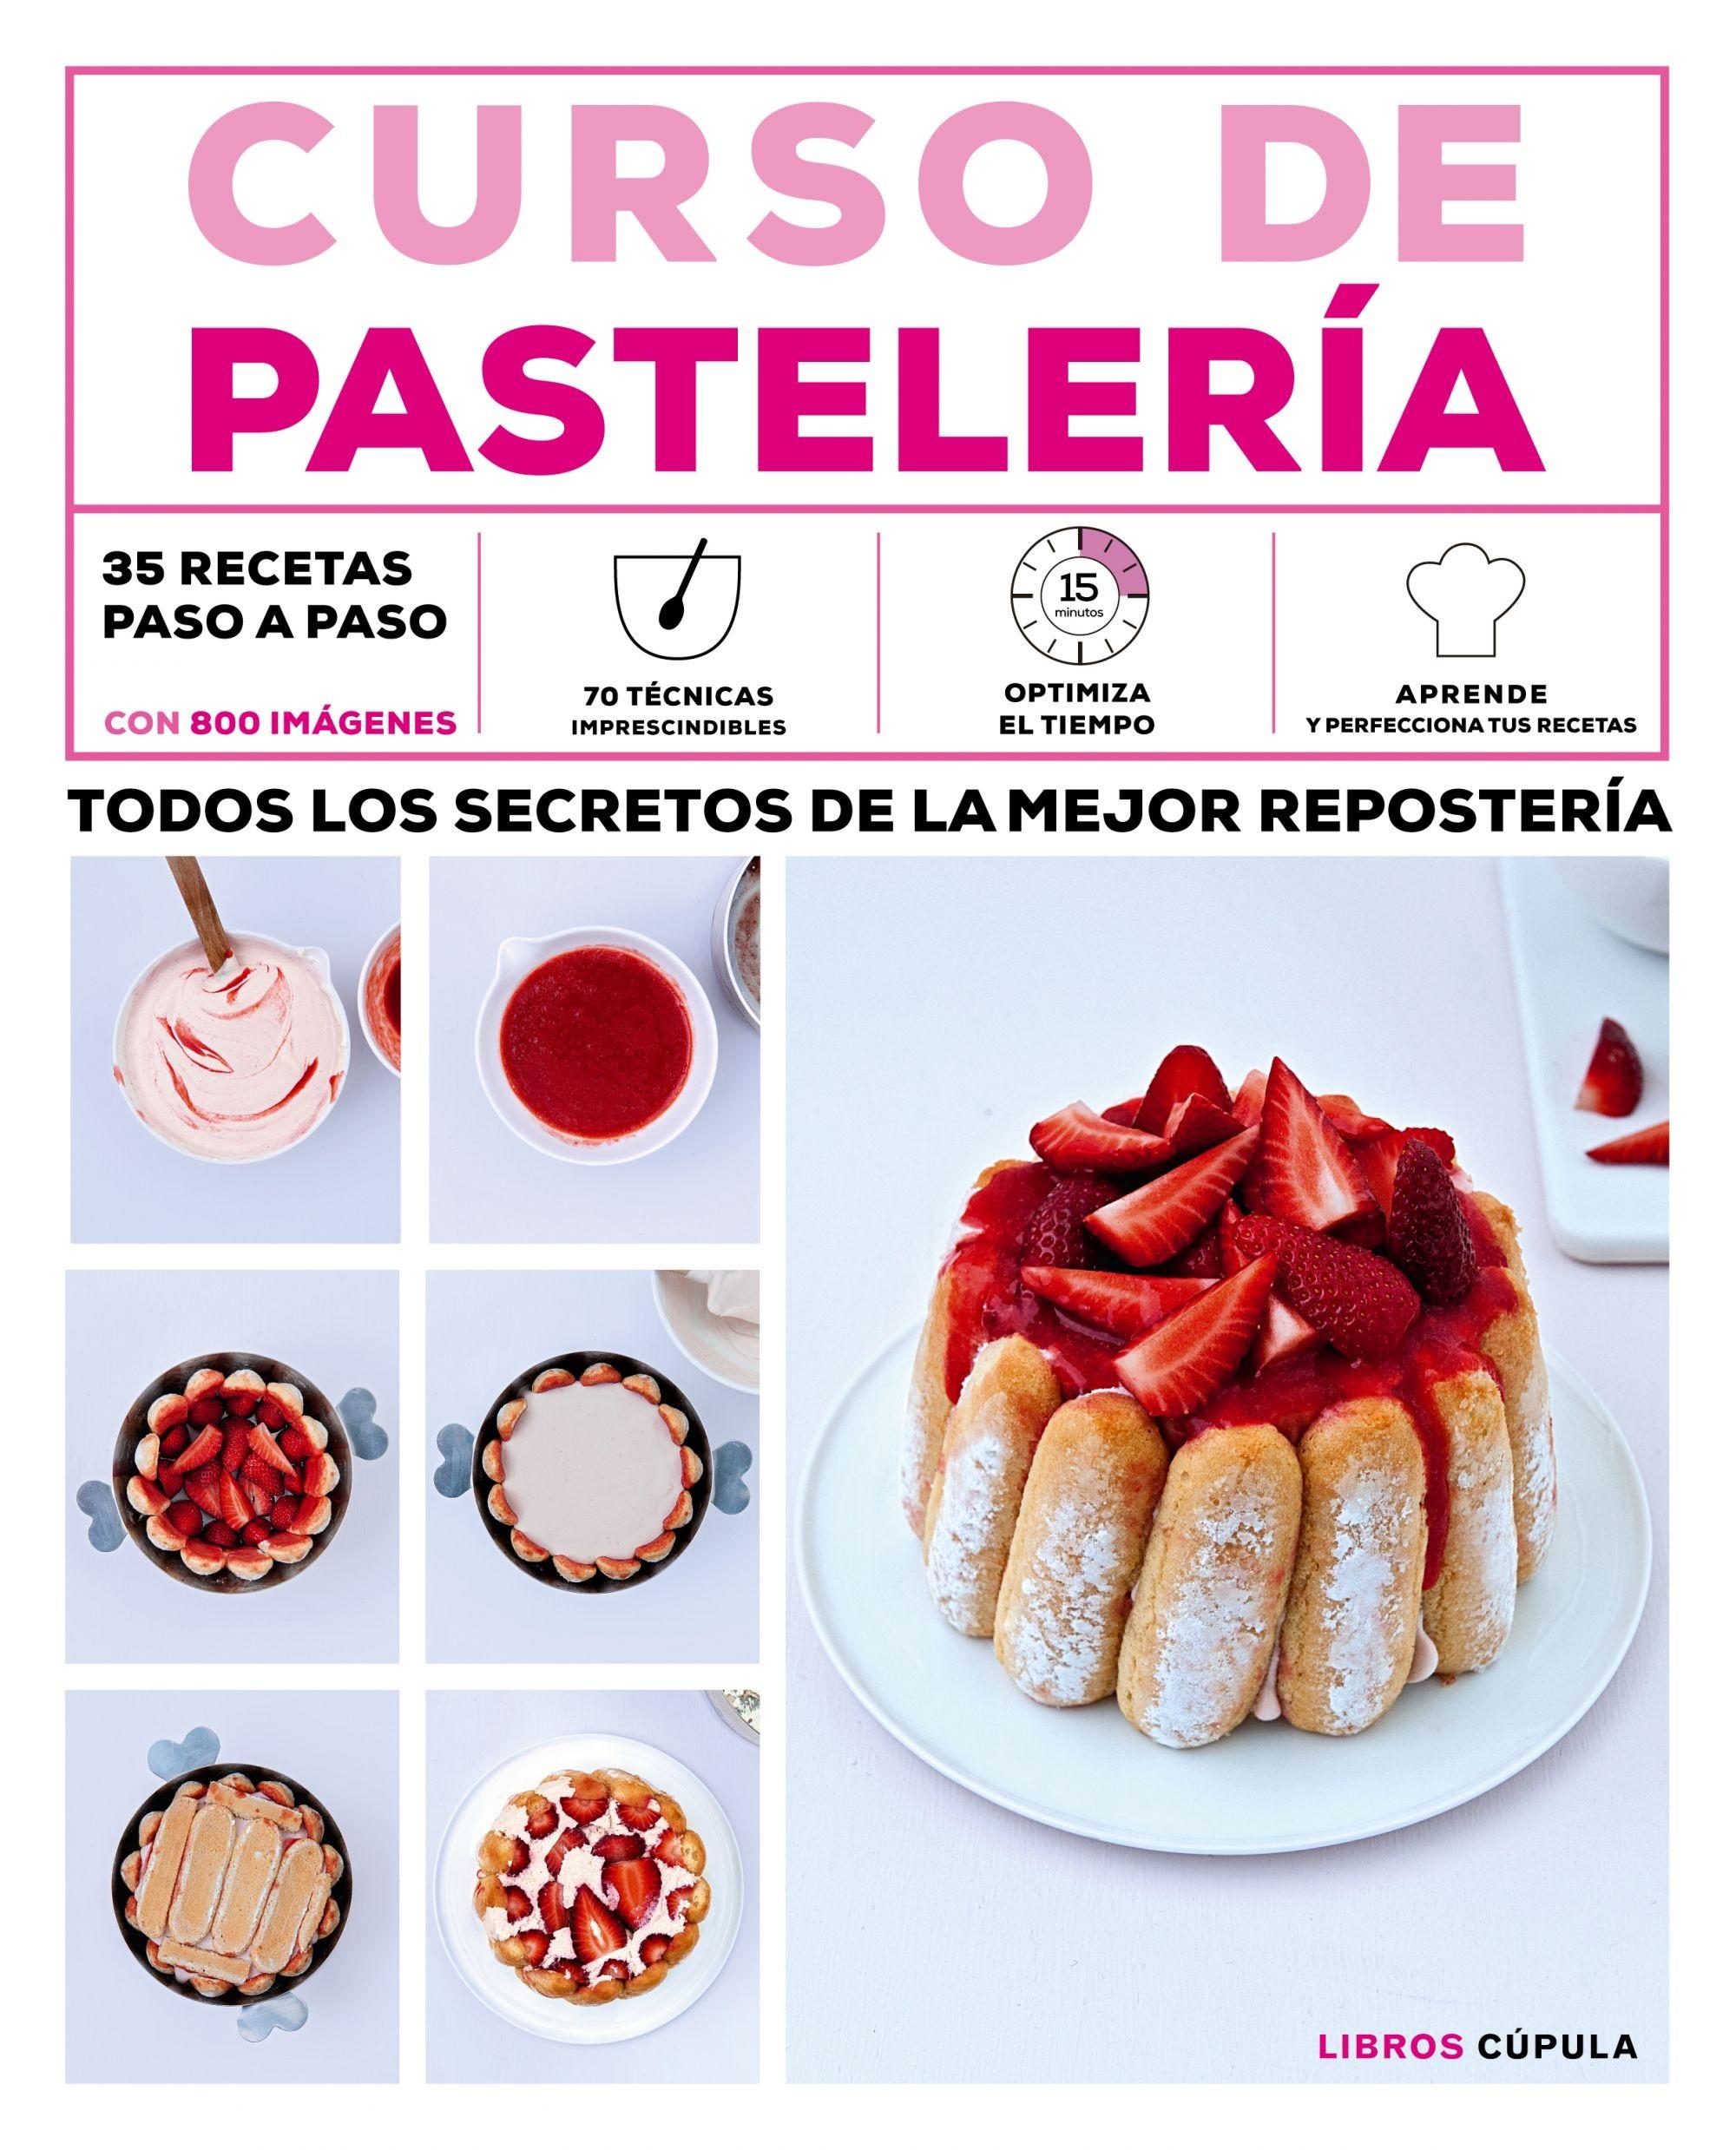 Curso de pastelería, libro de cocina